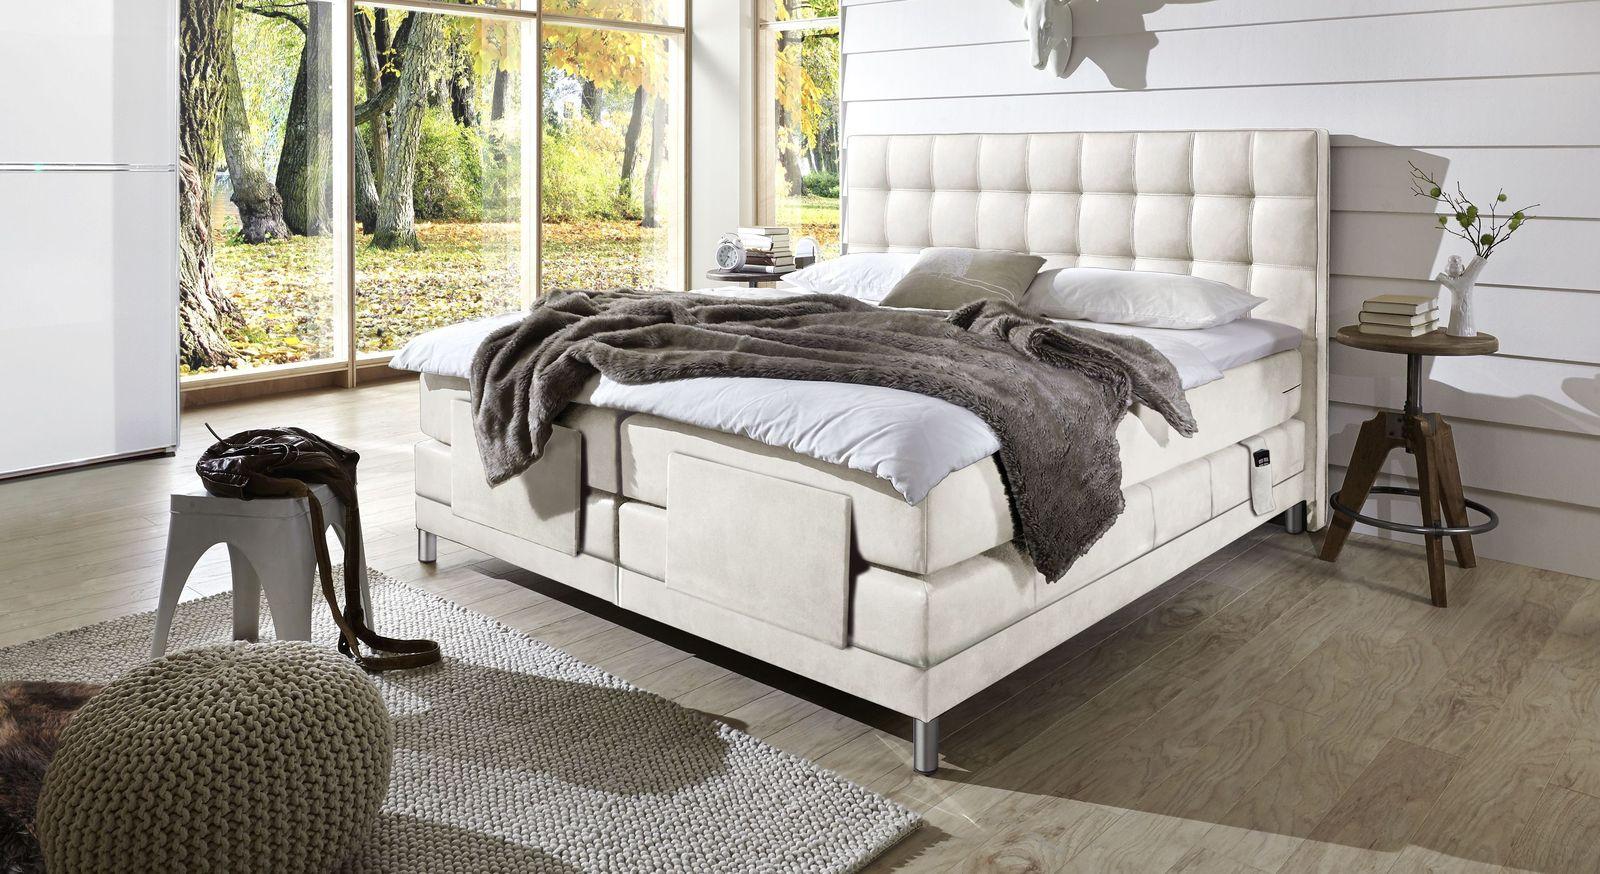 Boxspringbett Zamora Elektro mit Luxus-Kunstlederbezug in Weiß